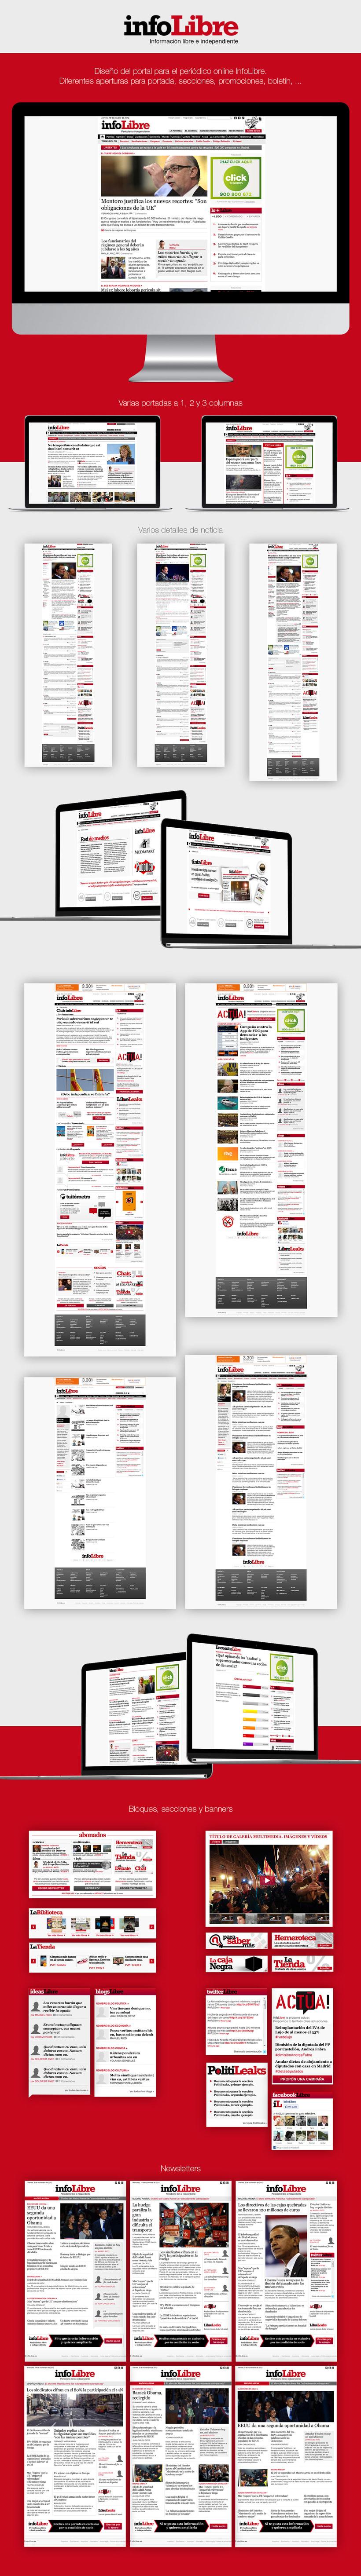 InfoLibre | Online newspaper 0